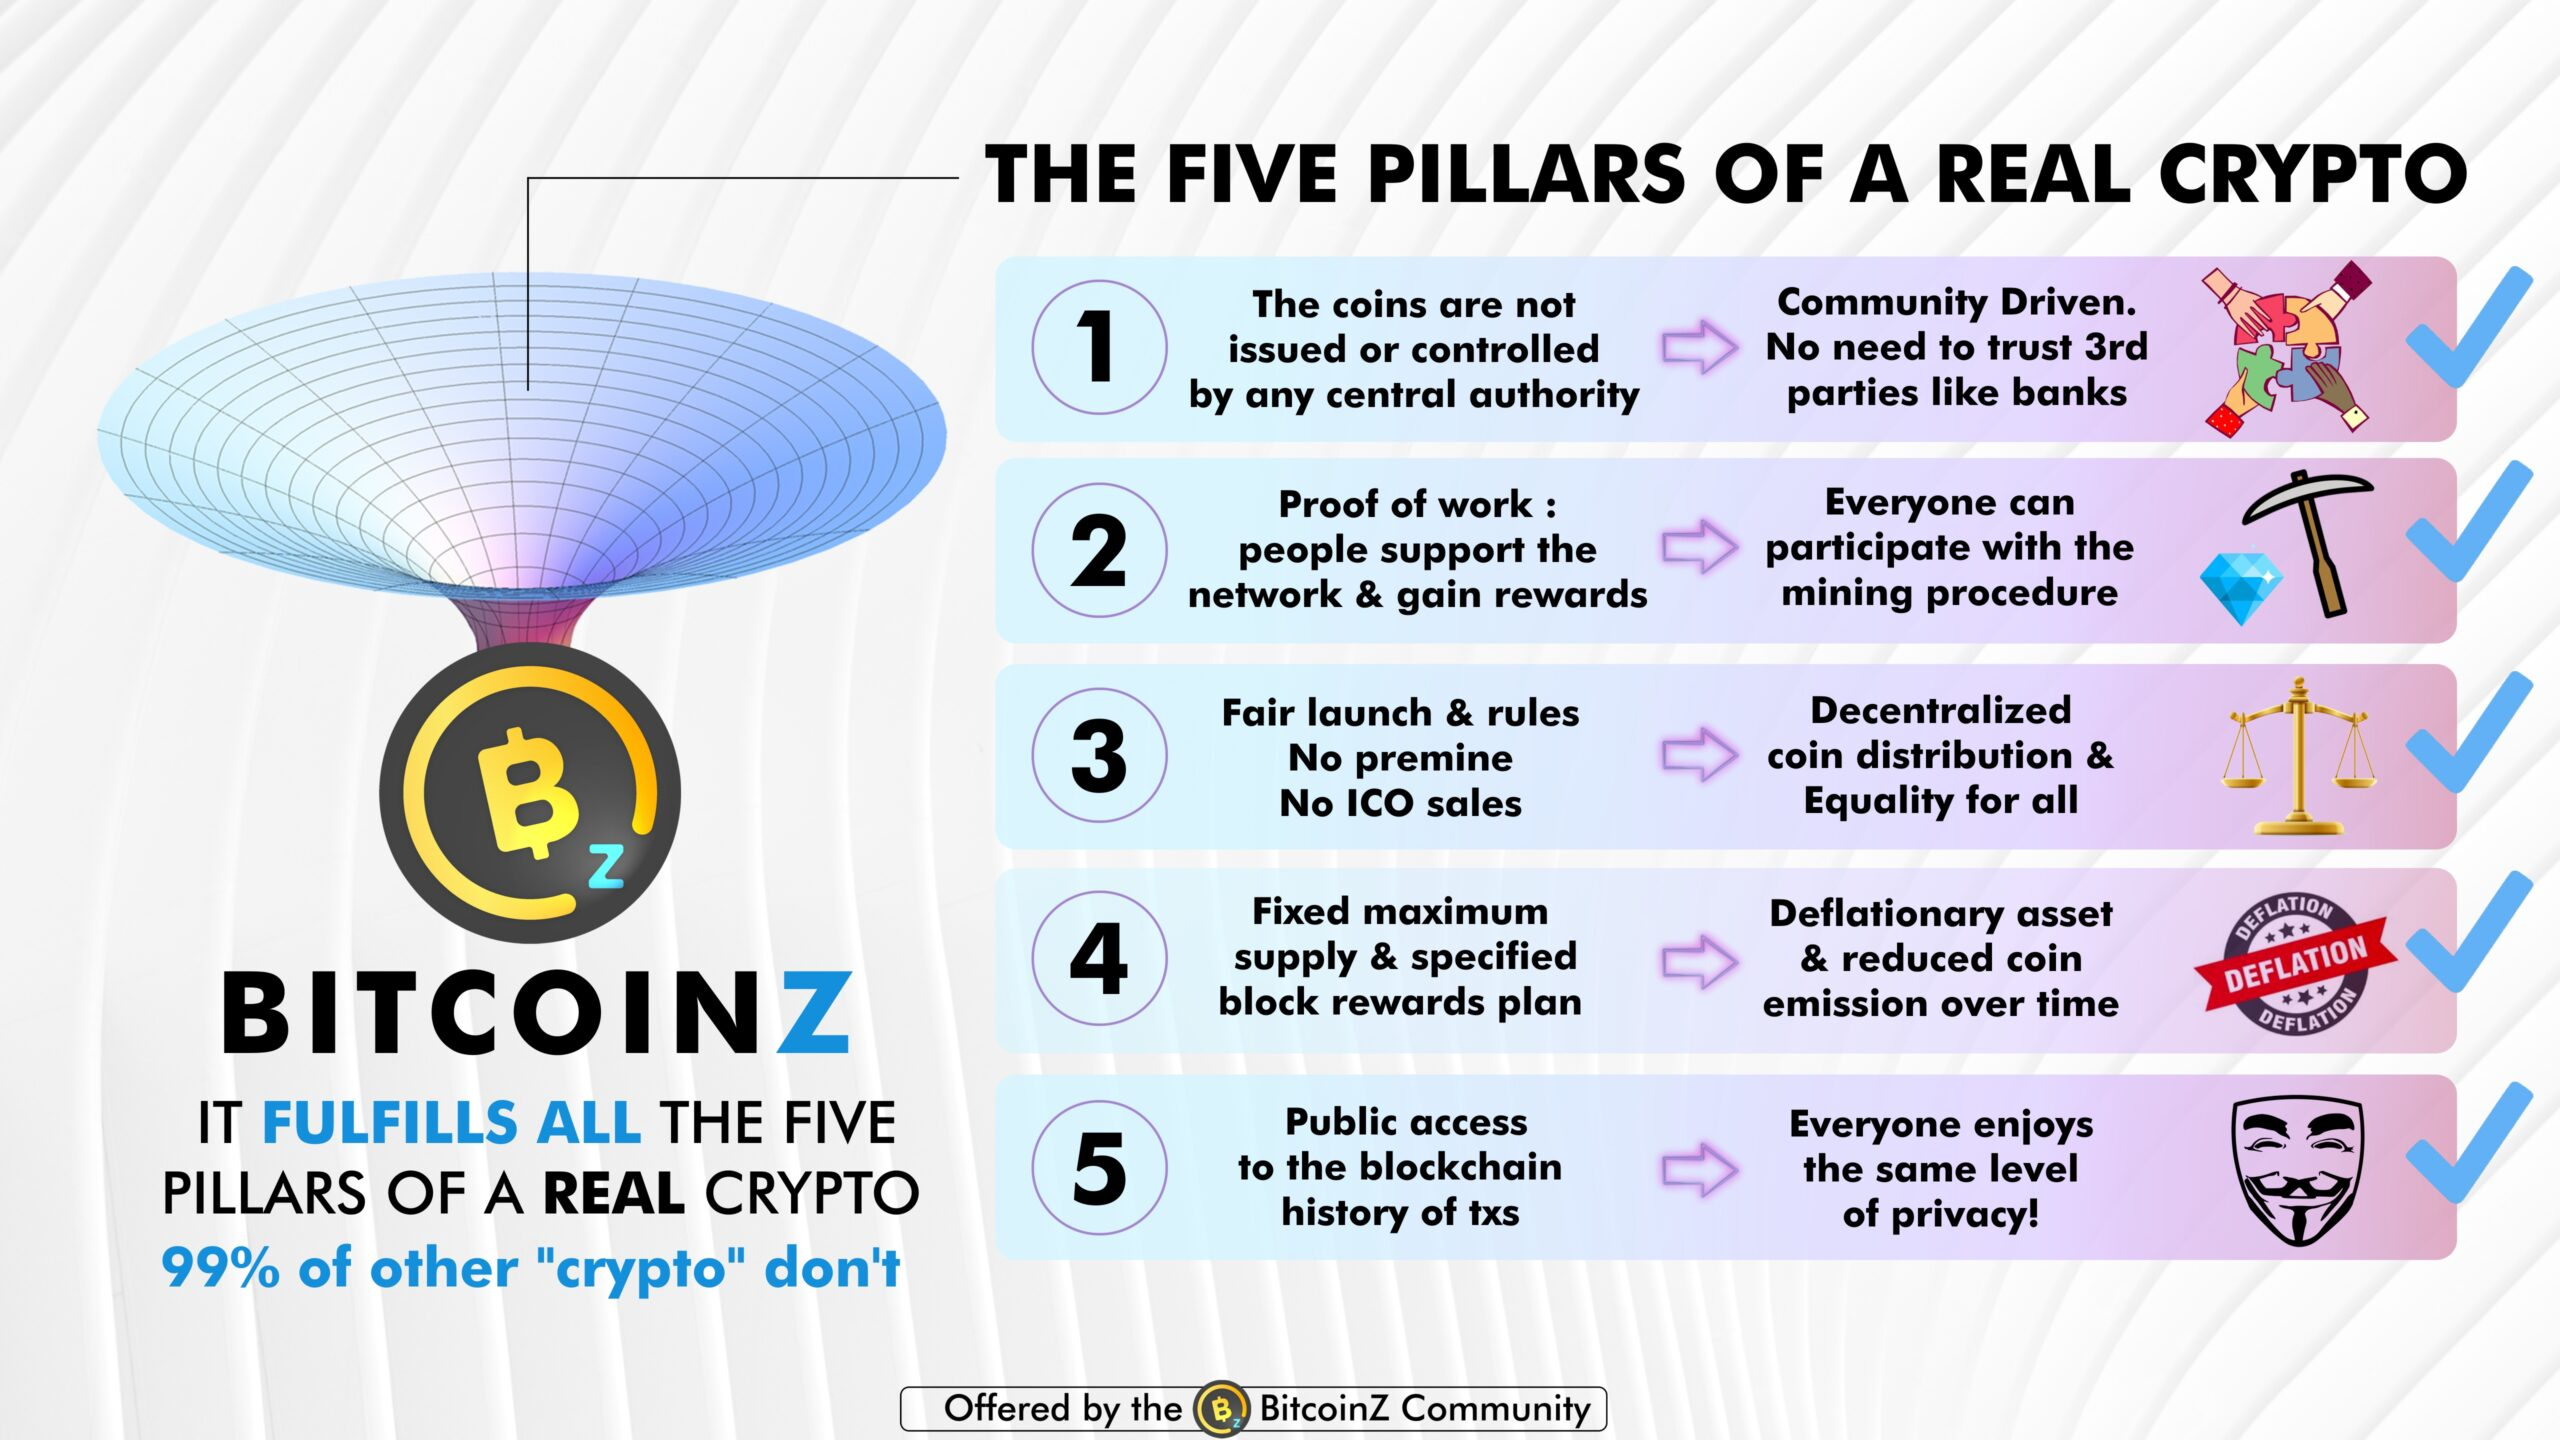 BitcoinZ characteristics